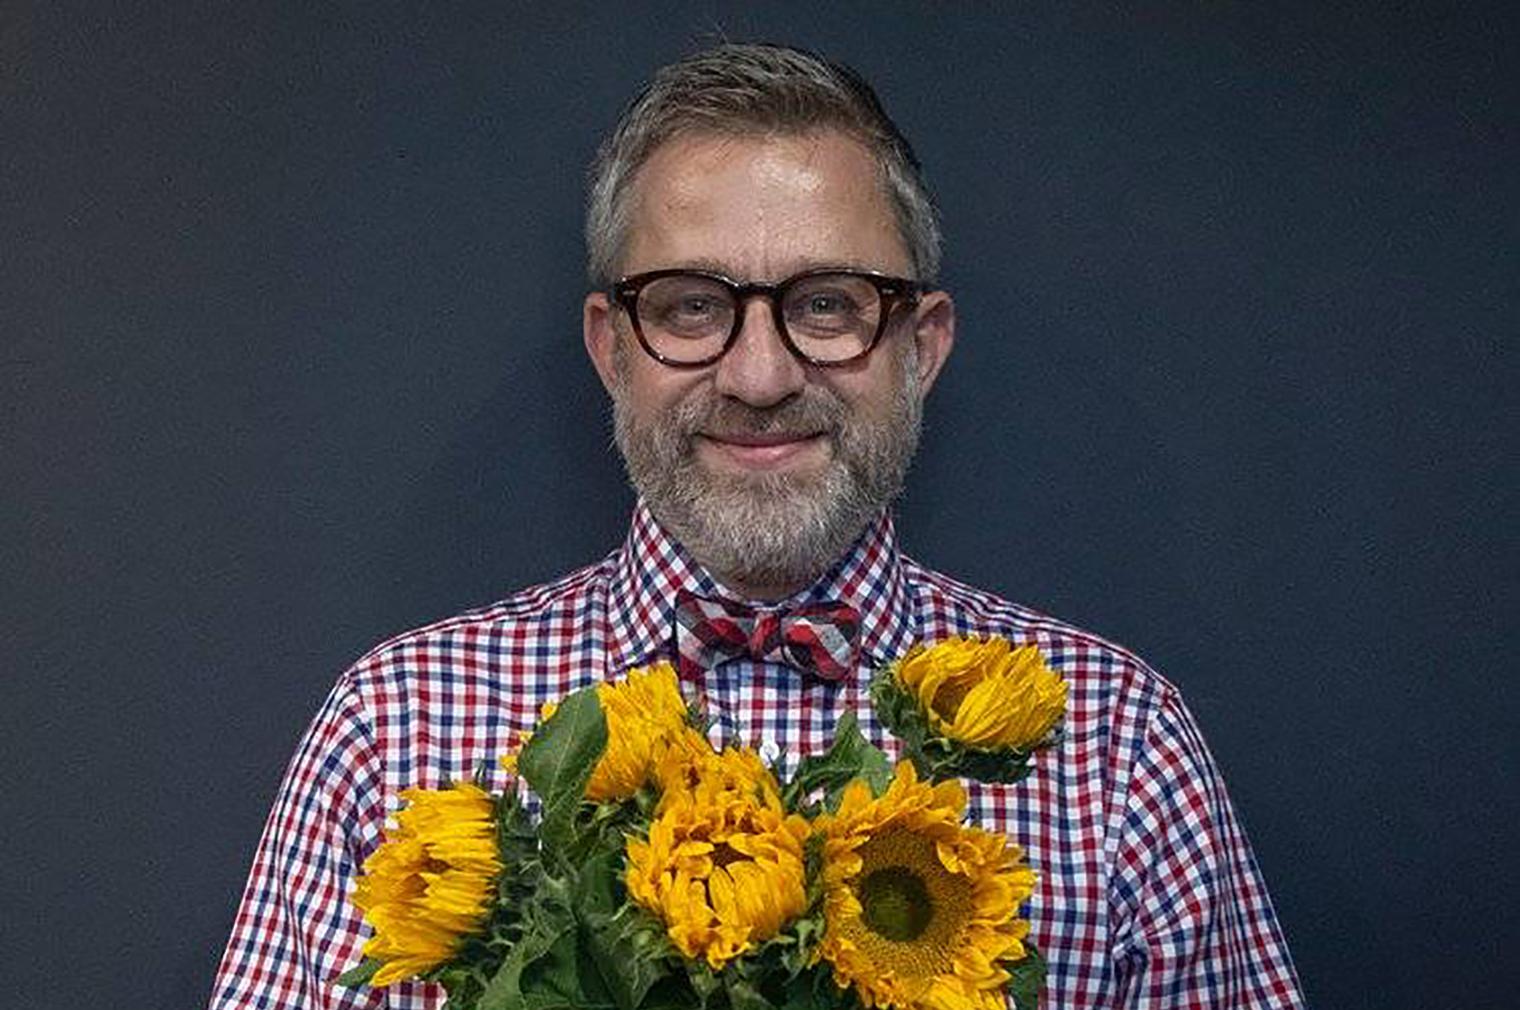 McQueens Flowers CEO Richard Eagleton